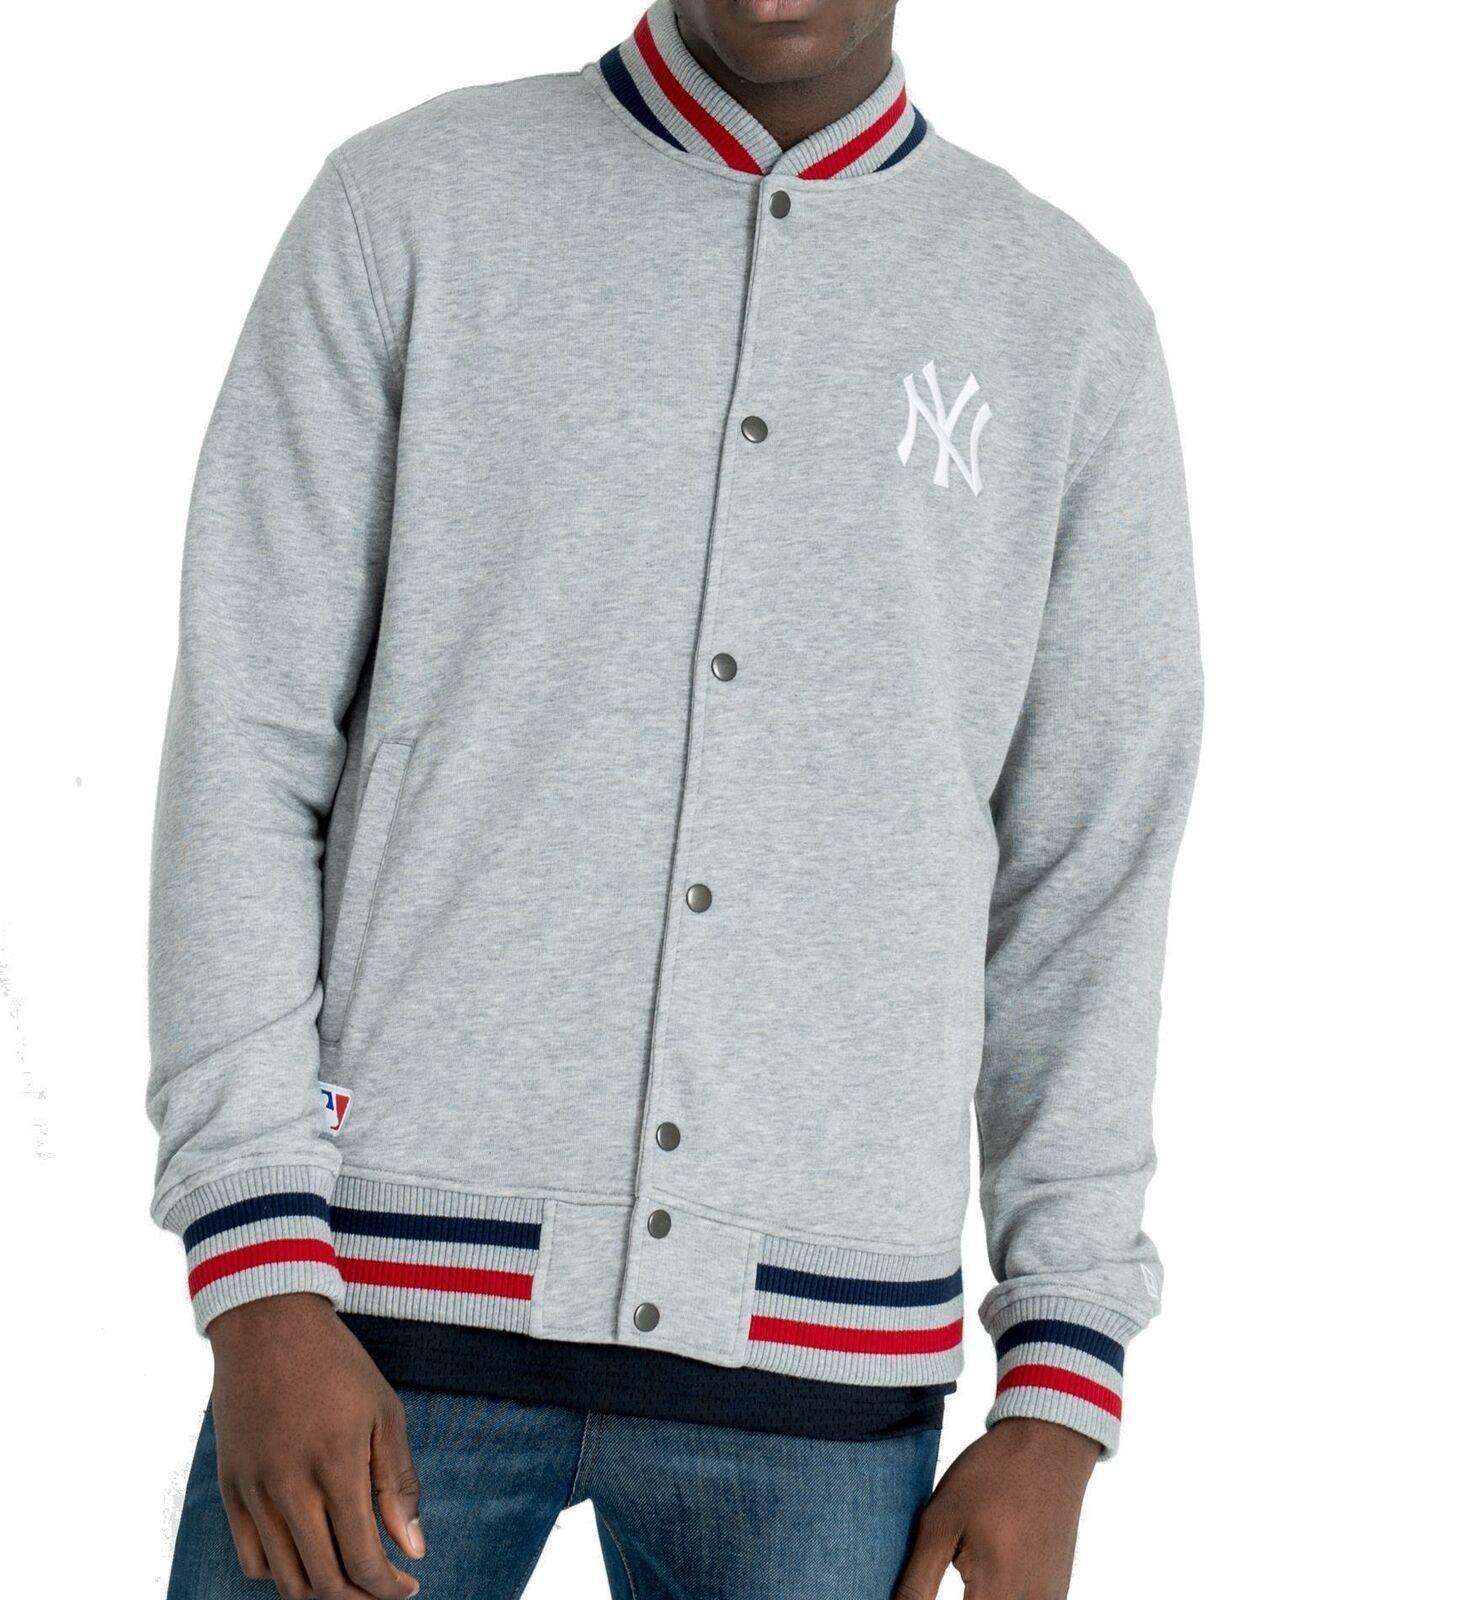 New Era Varsity jacke New York Yankees lightgrau